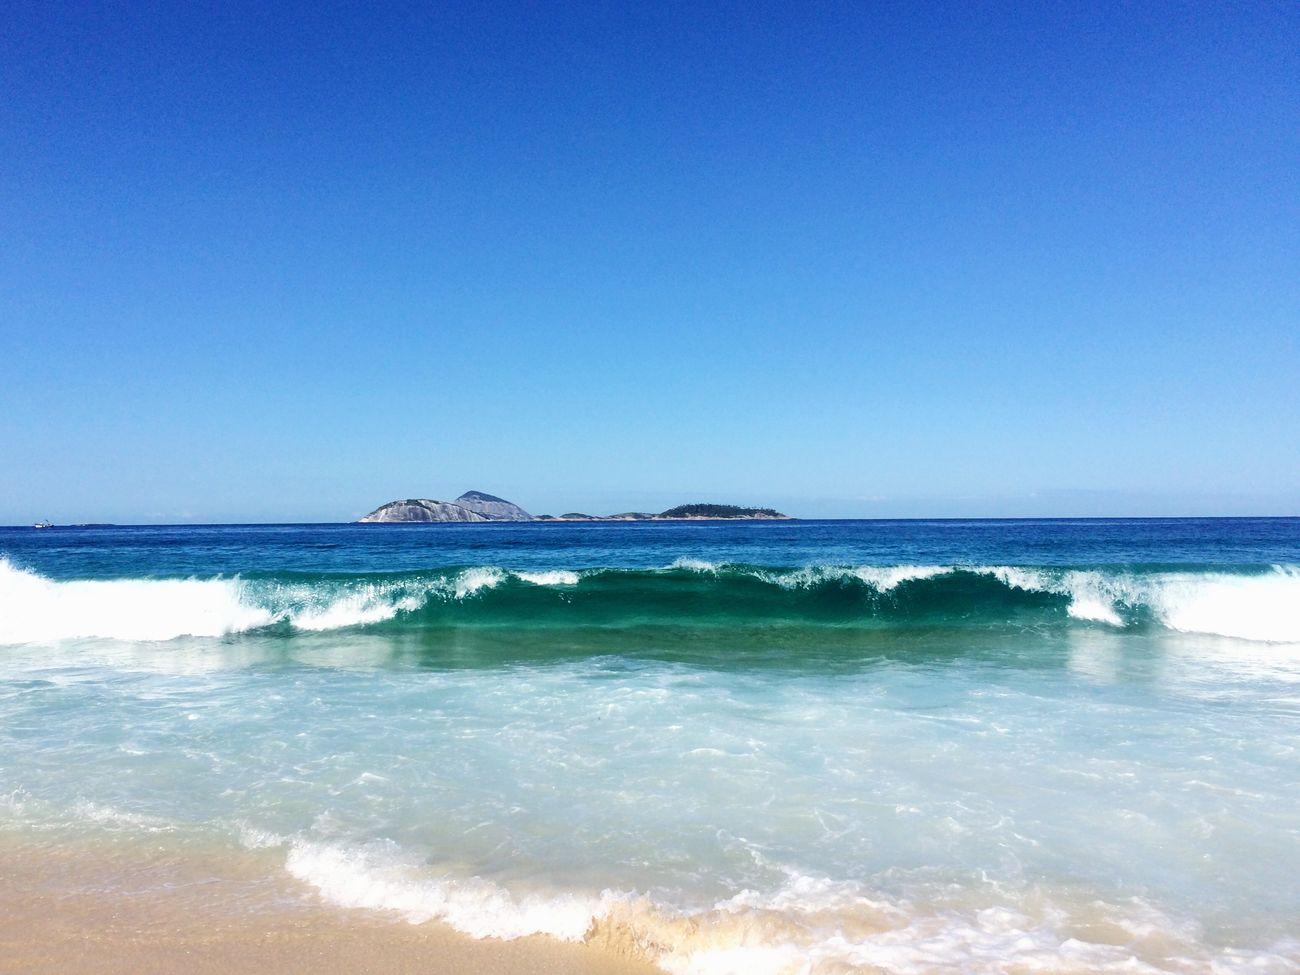 Ipanema Beach Ipanema Beautiful Life Is A Beach Beach Rio De Janeiro Open Edit Ocean View IPhoneography Surf's Up Blue Wave